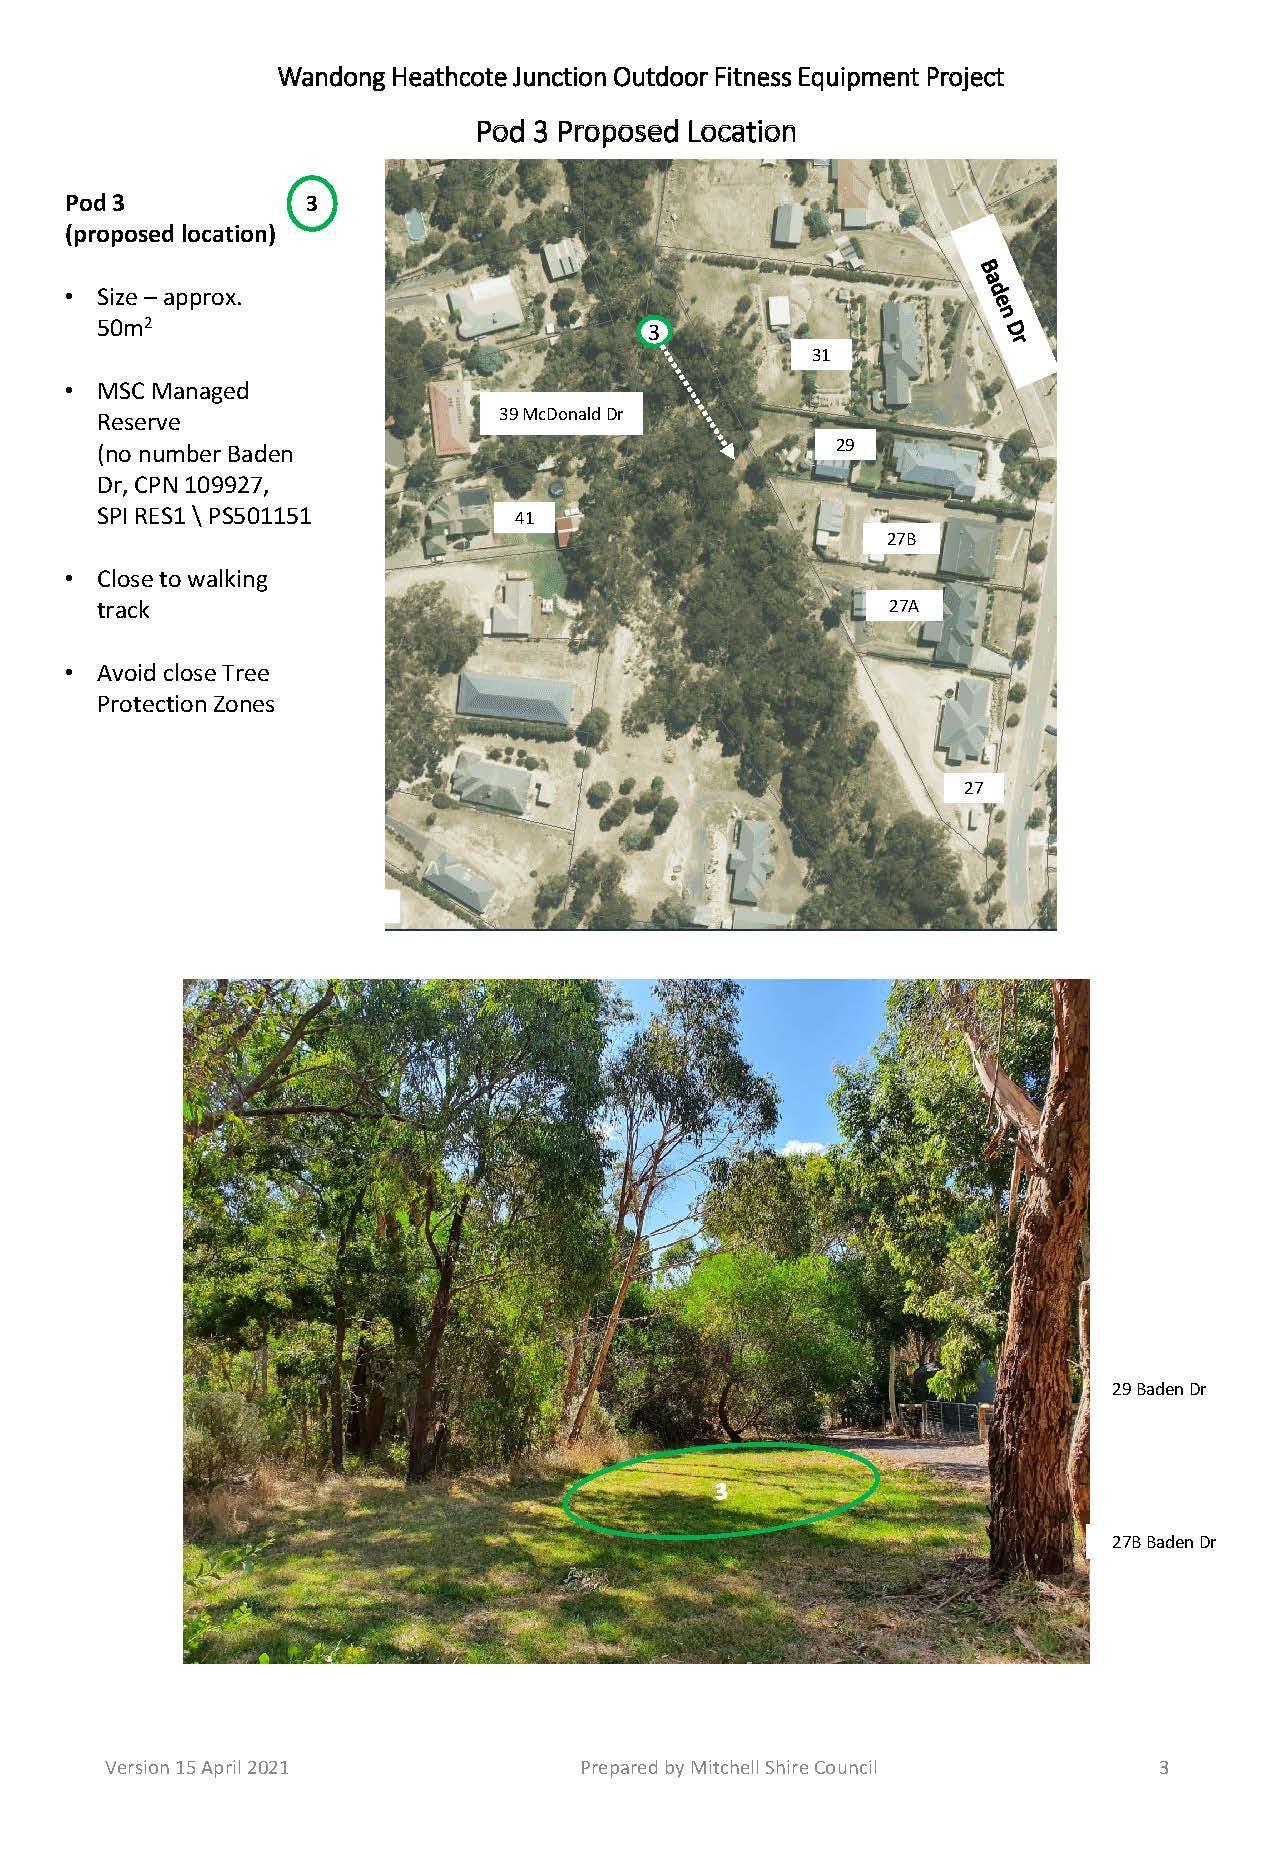 WDHJ Proposed Pod locations Apr2021_Page_3.jpg